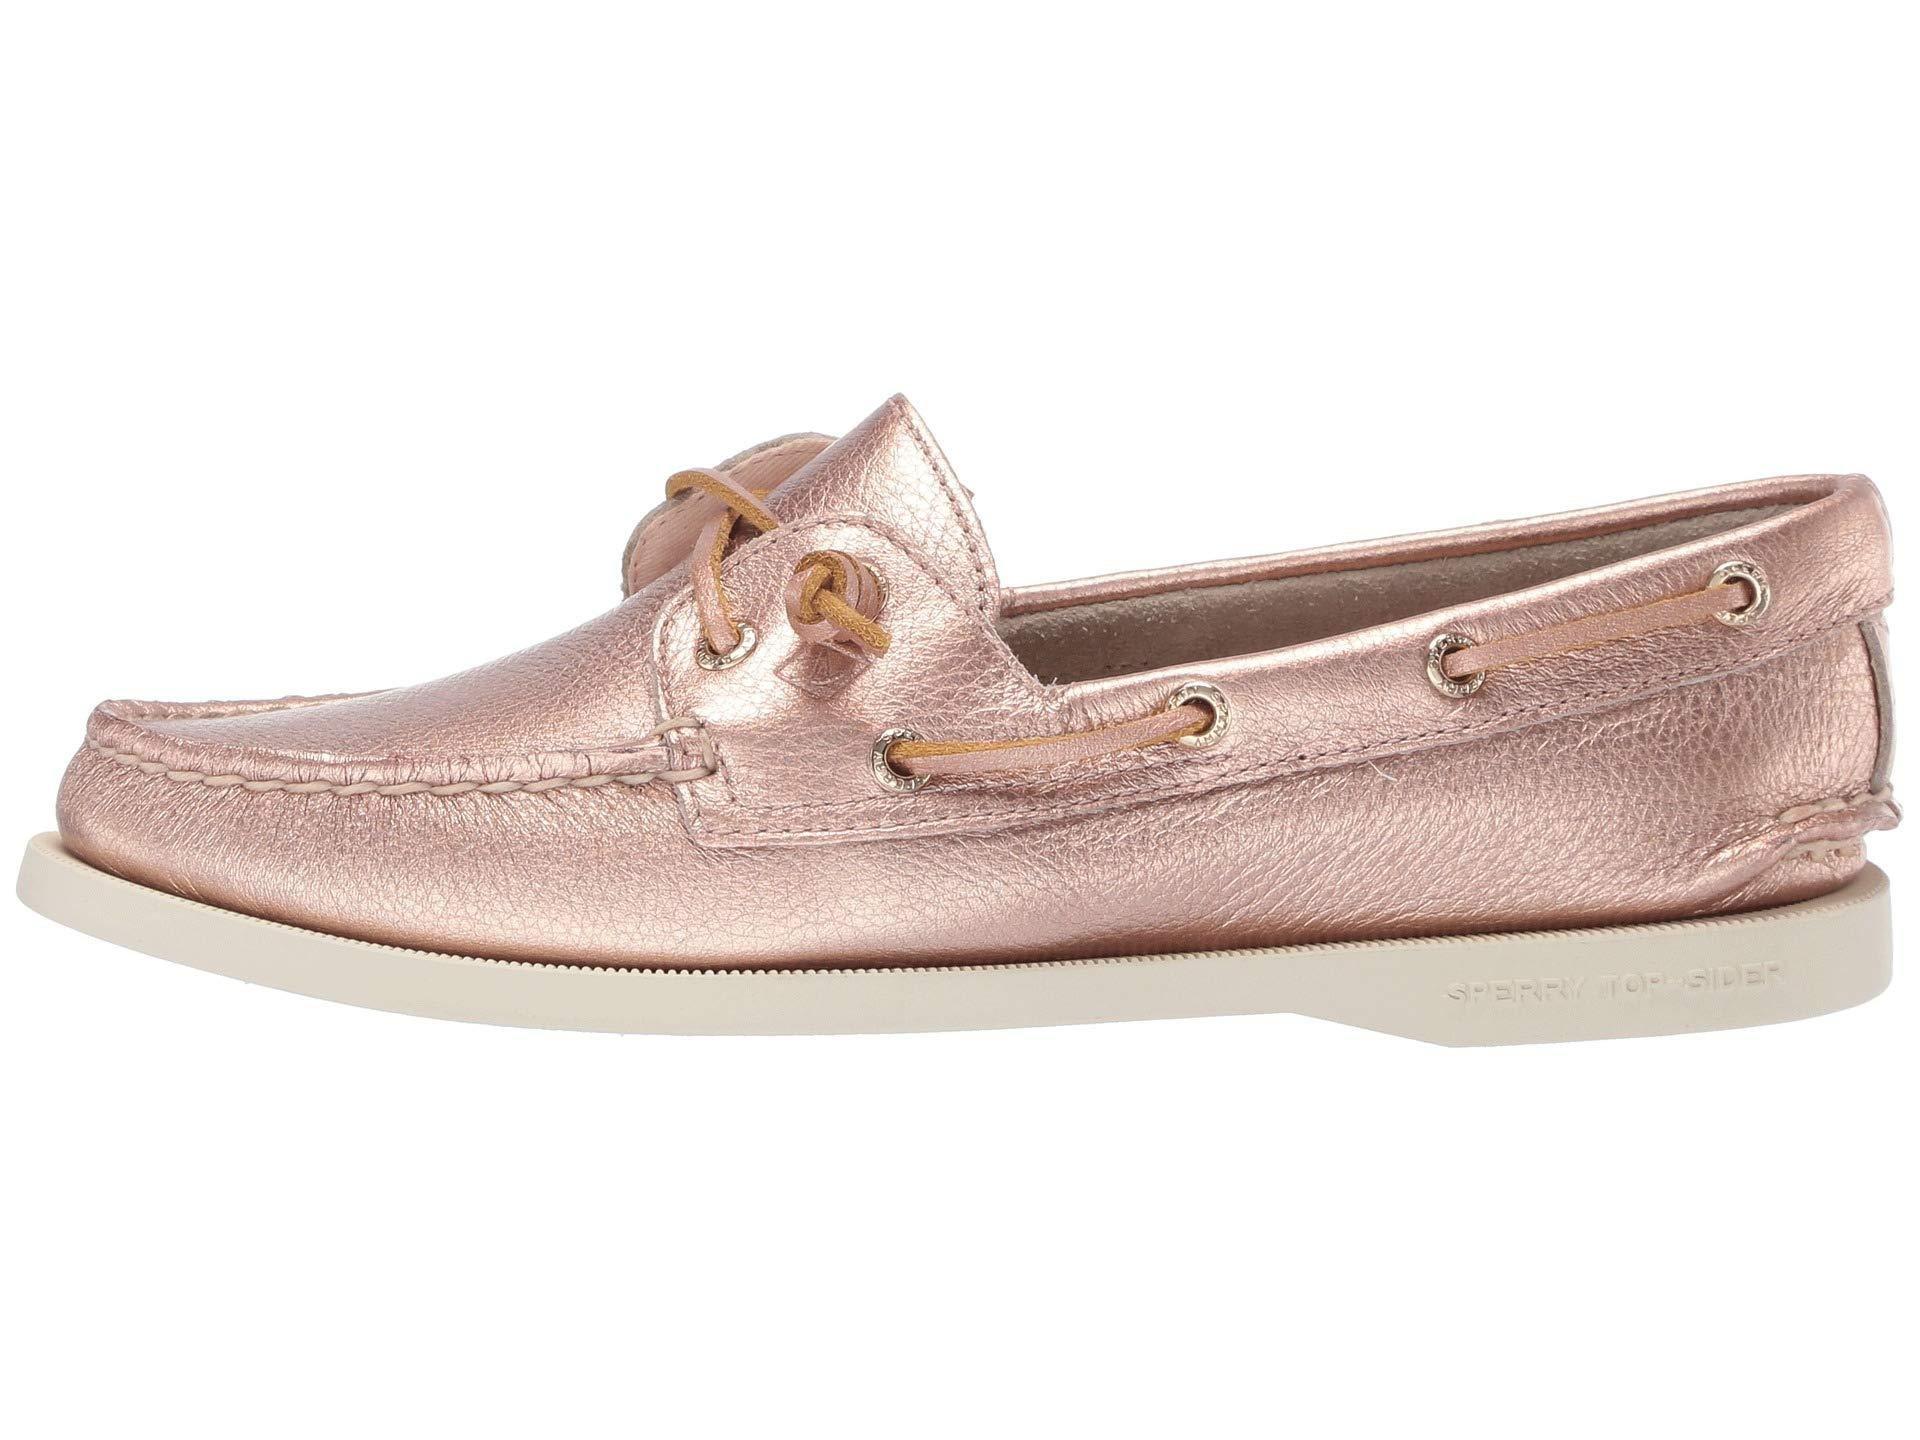 62d6c83c942d Sperry Top-Sider Authentic Original Vida Metallic (rose Gold) Women s Shoes  - Lyst